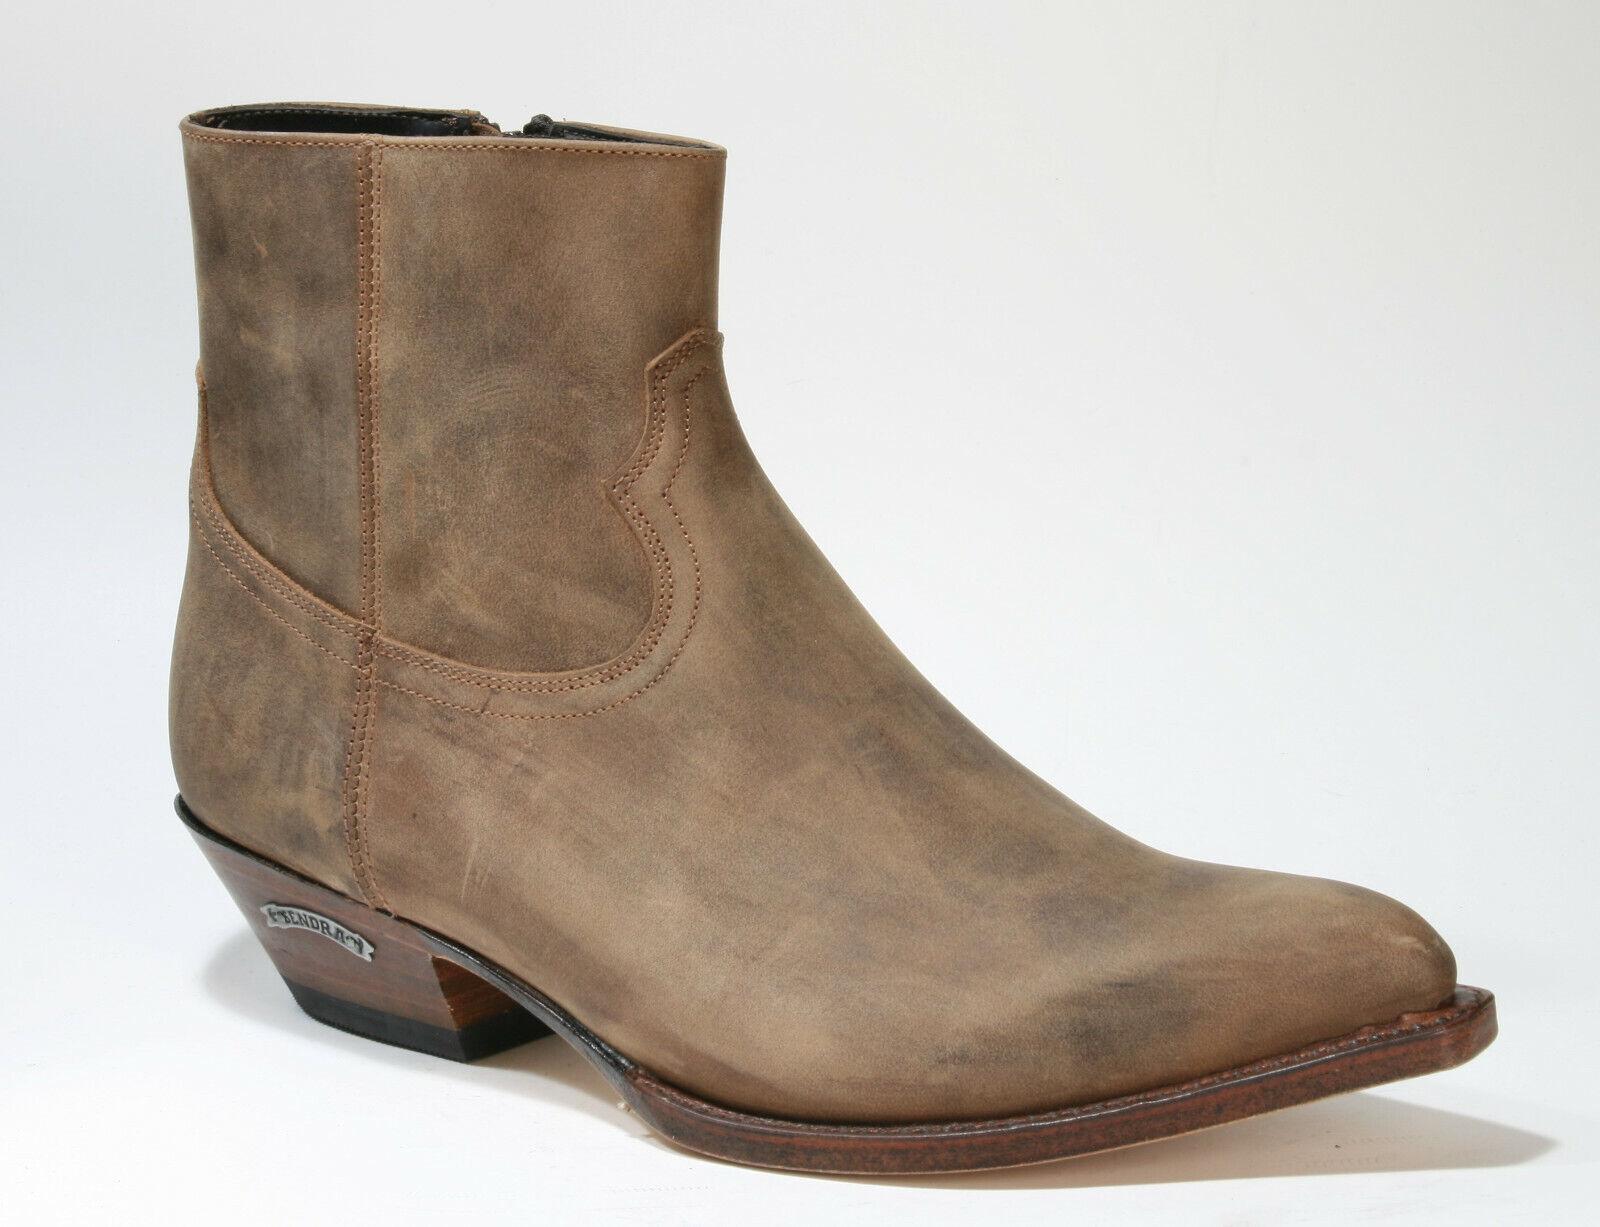 13659 Sendra Stiefelette Kansas Lavado Rahmengenähte Schuhe